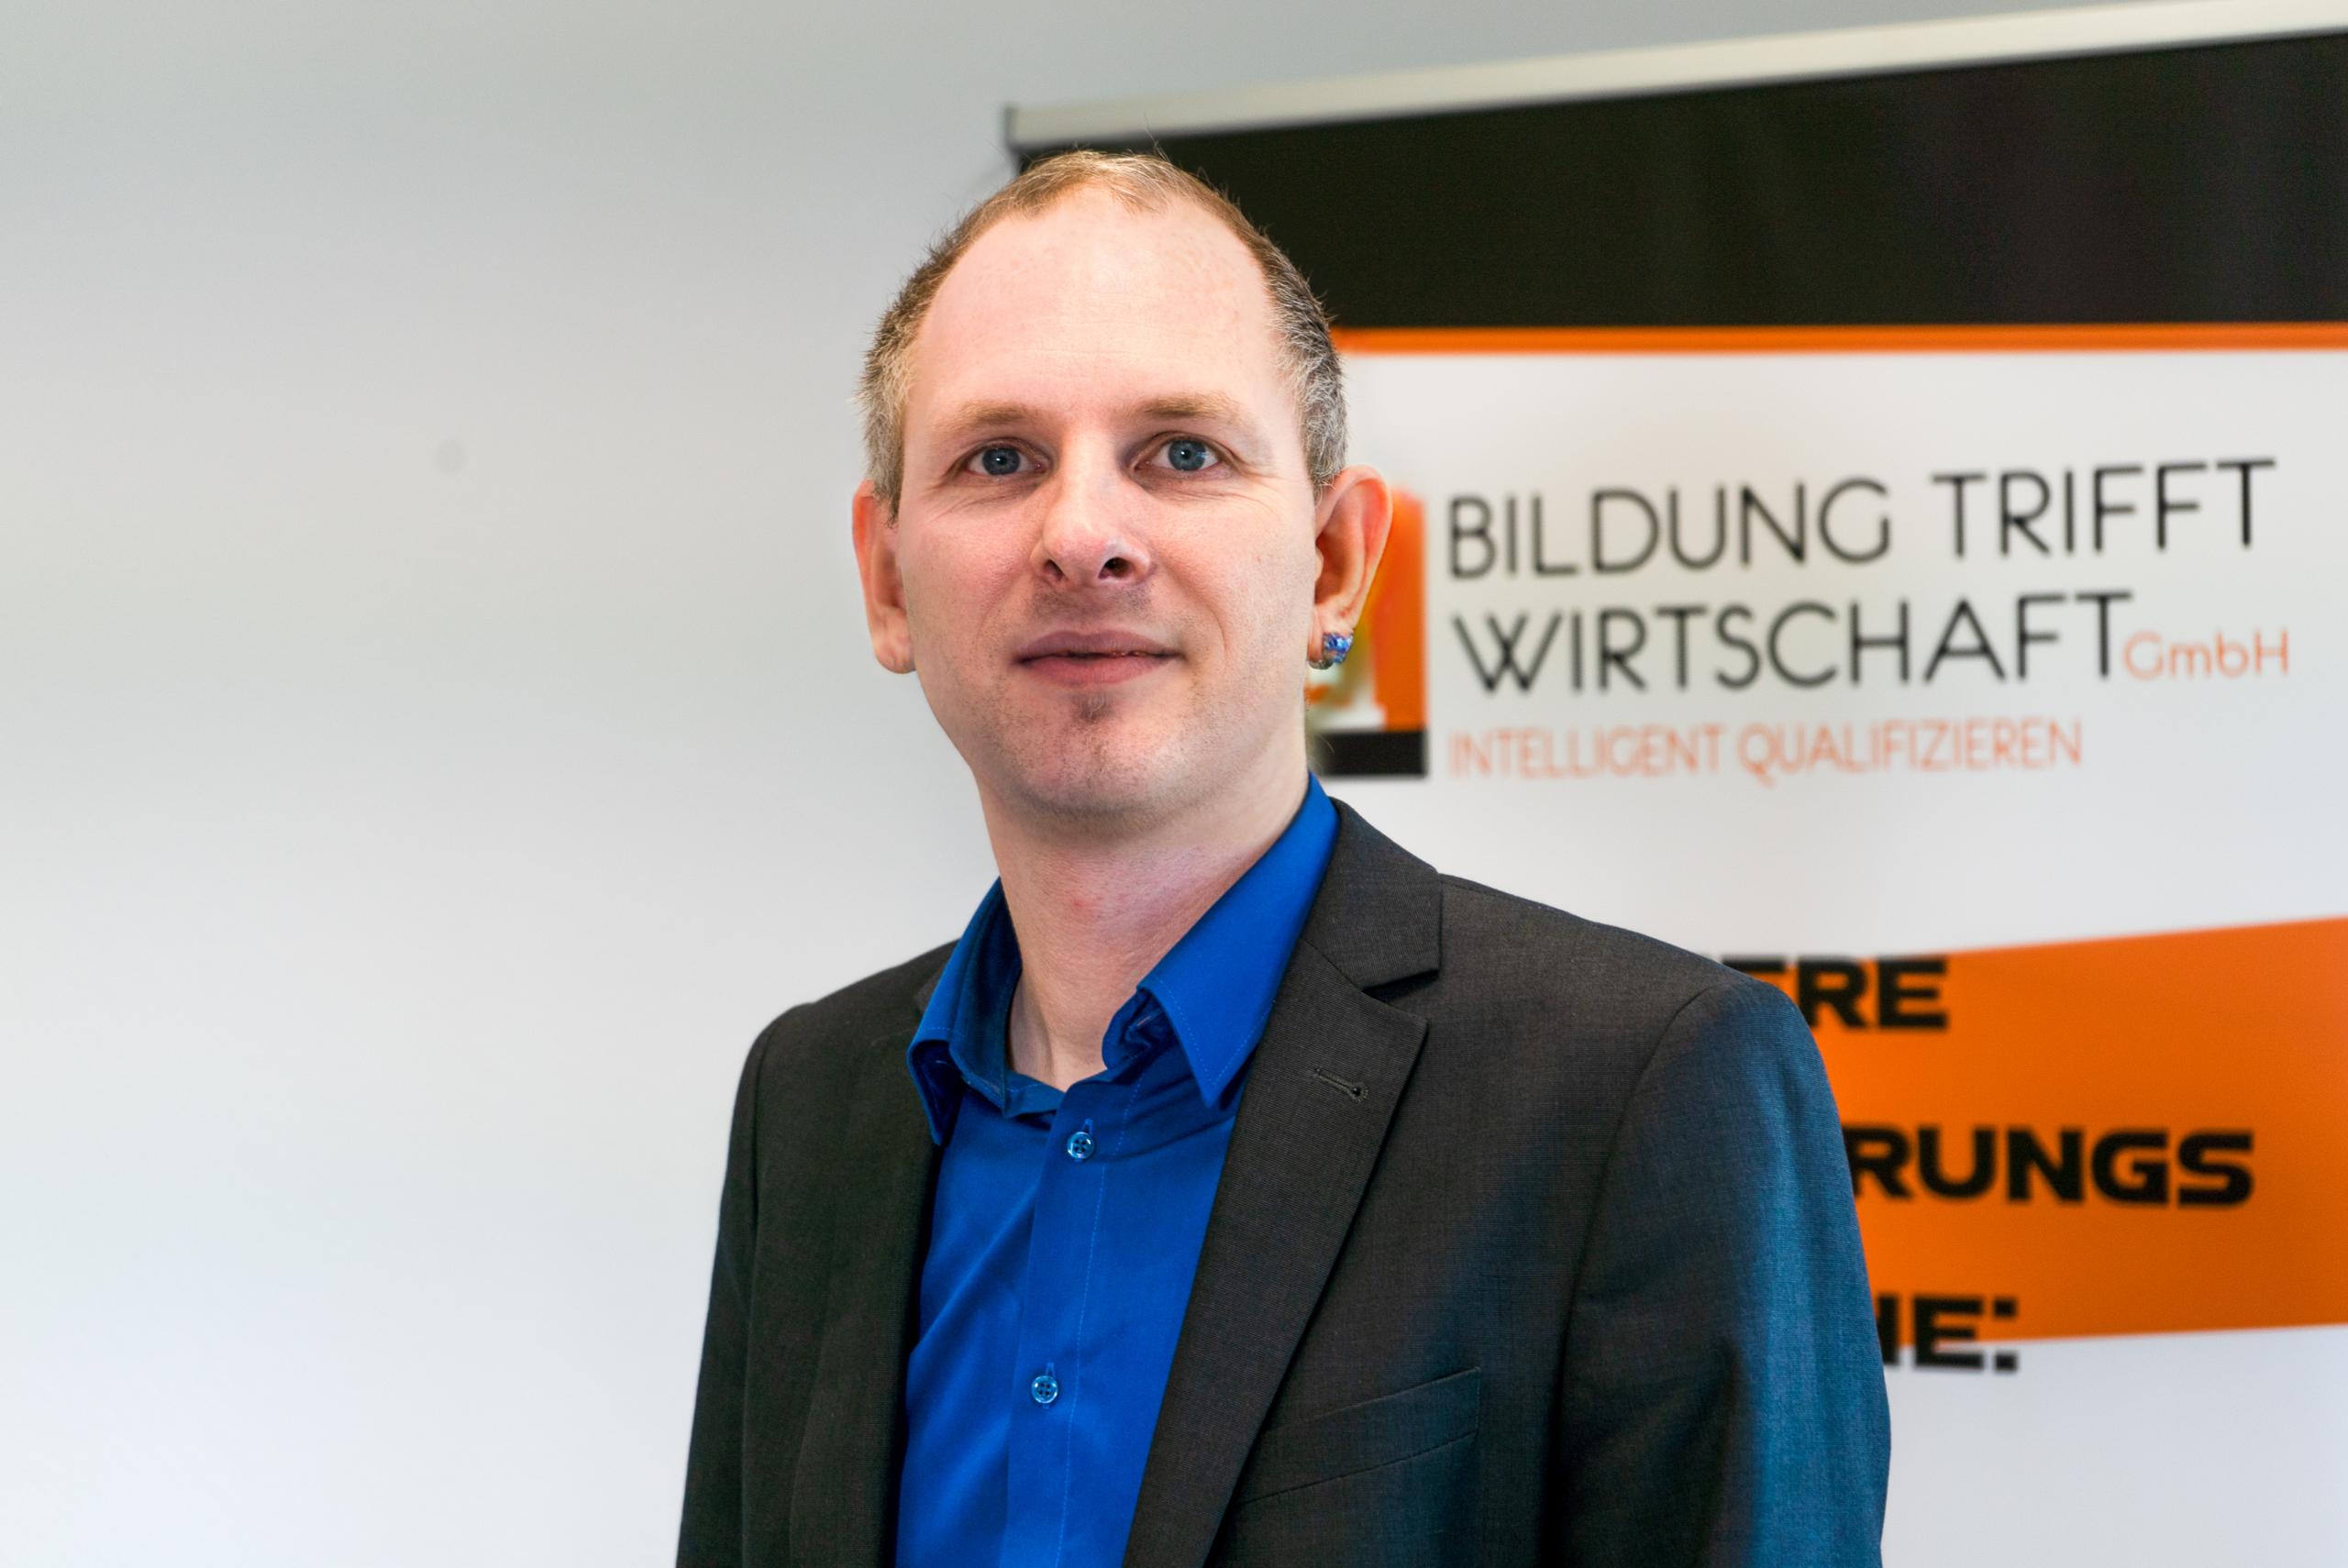 Christian Dlugosch